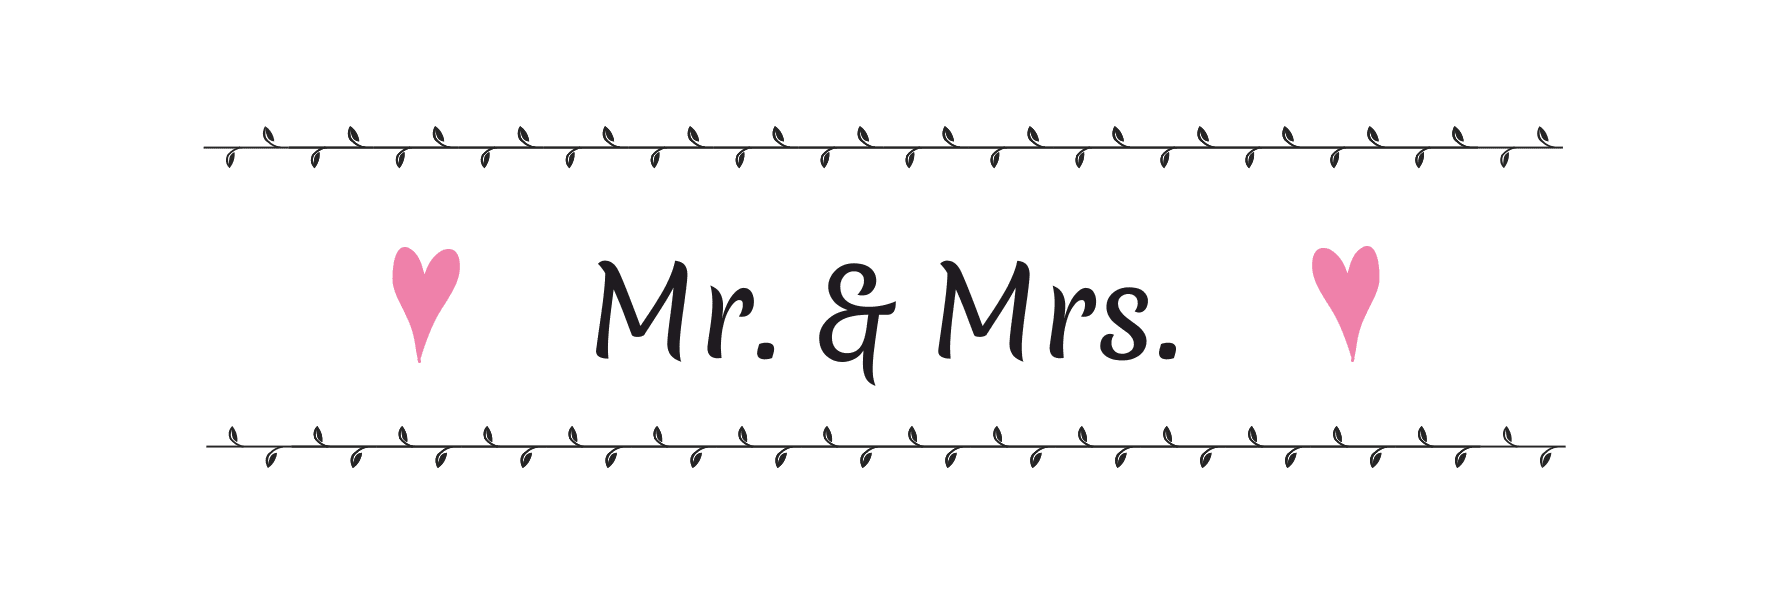 Kollektion Mr. & Mrs.